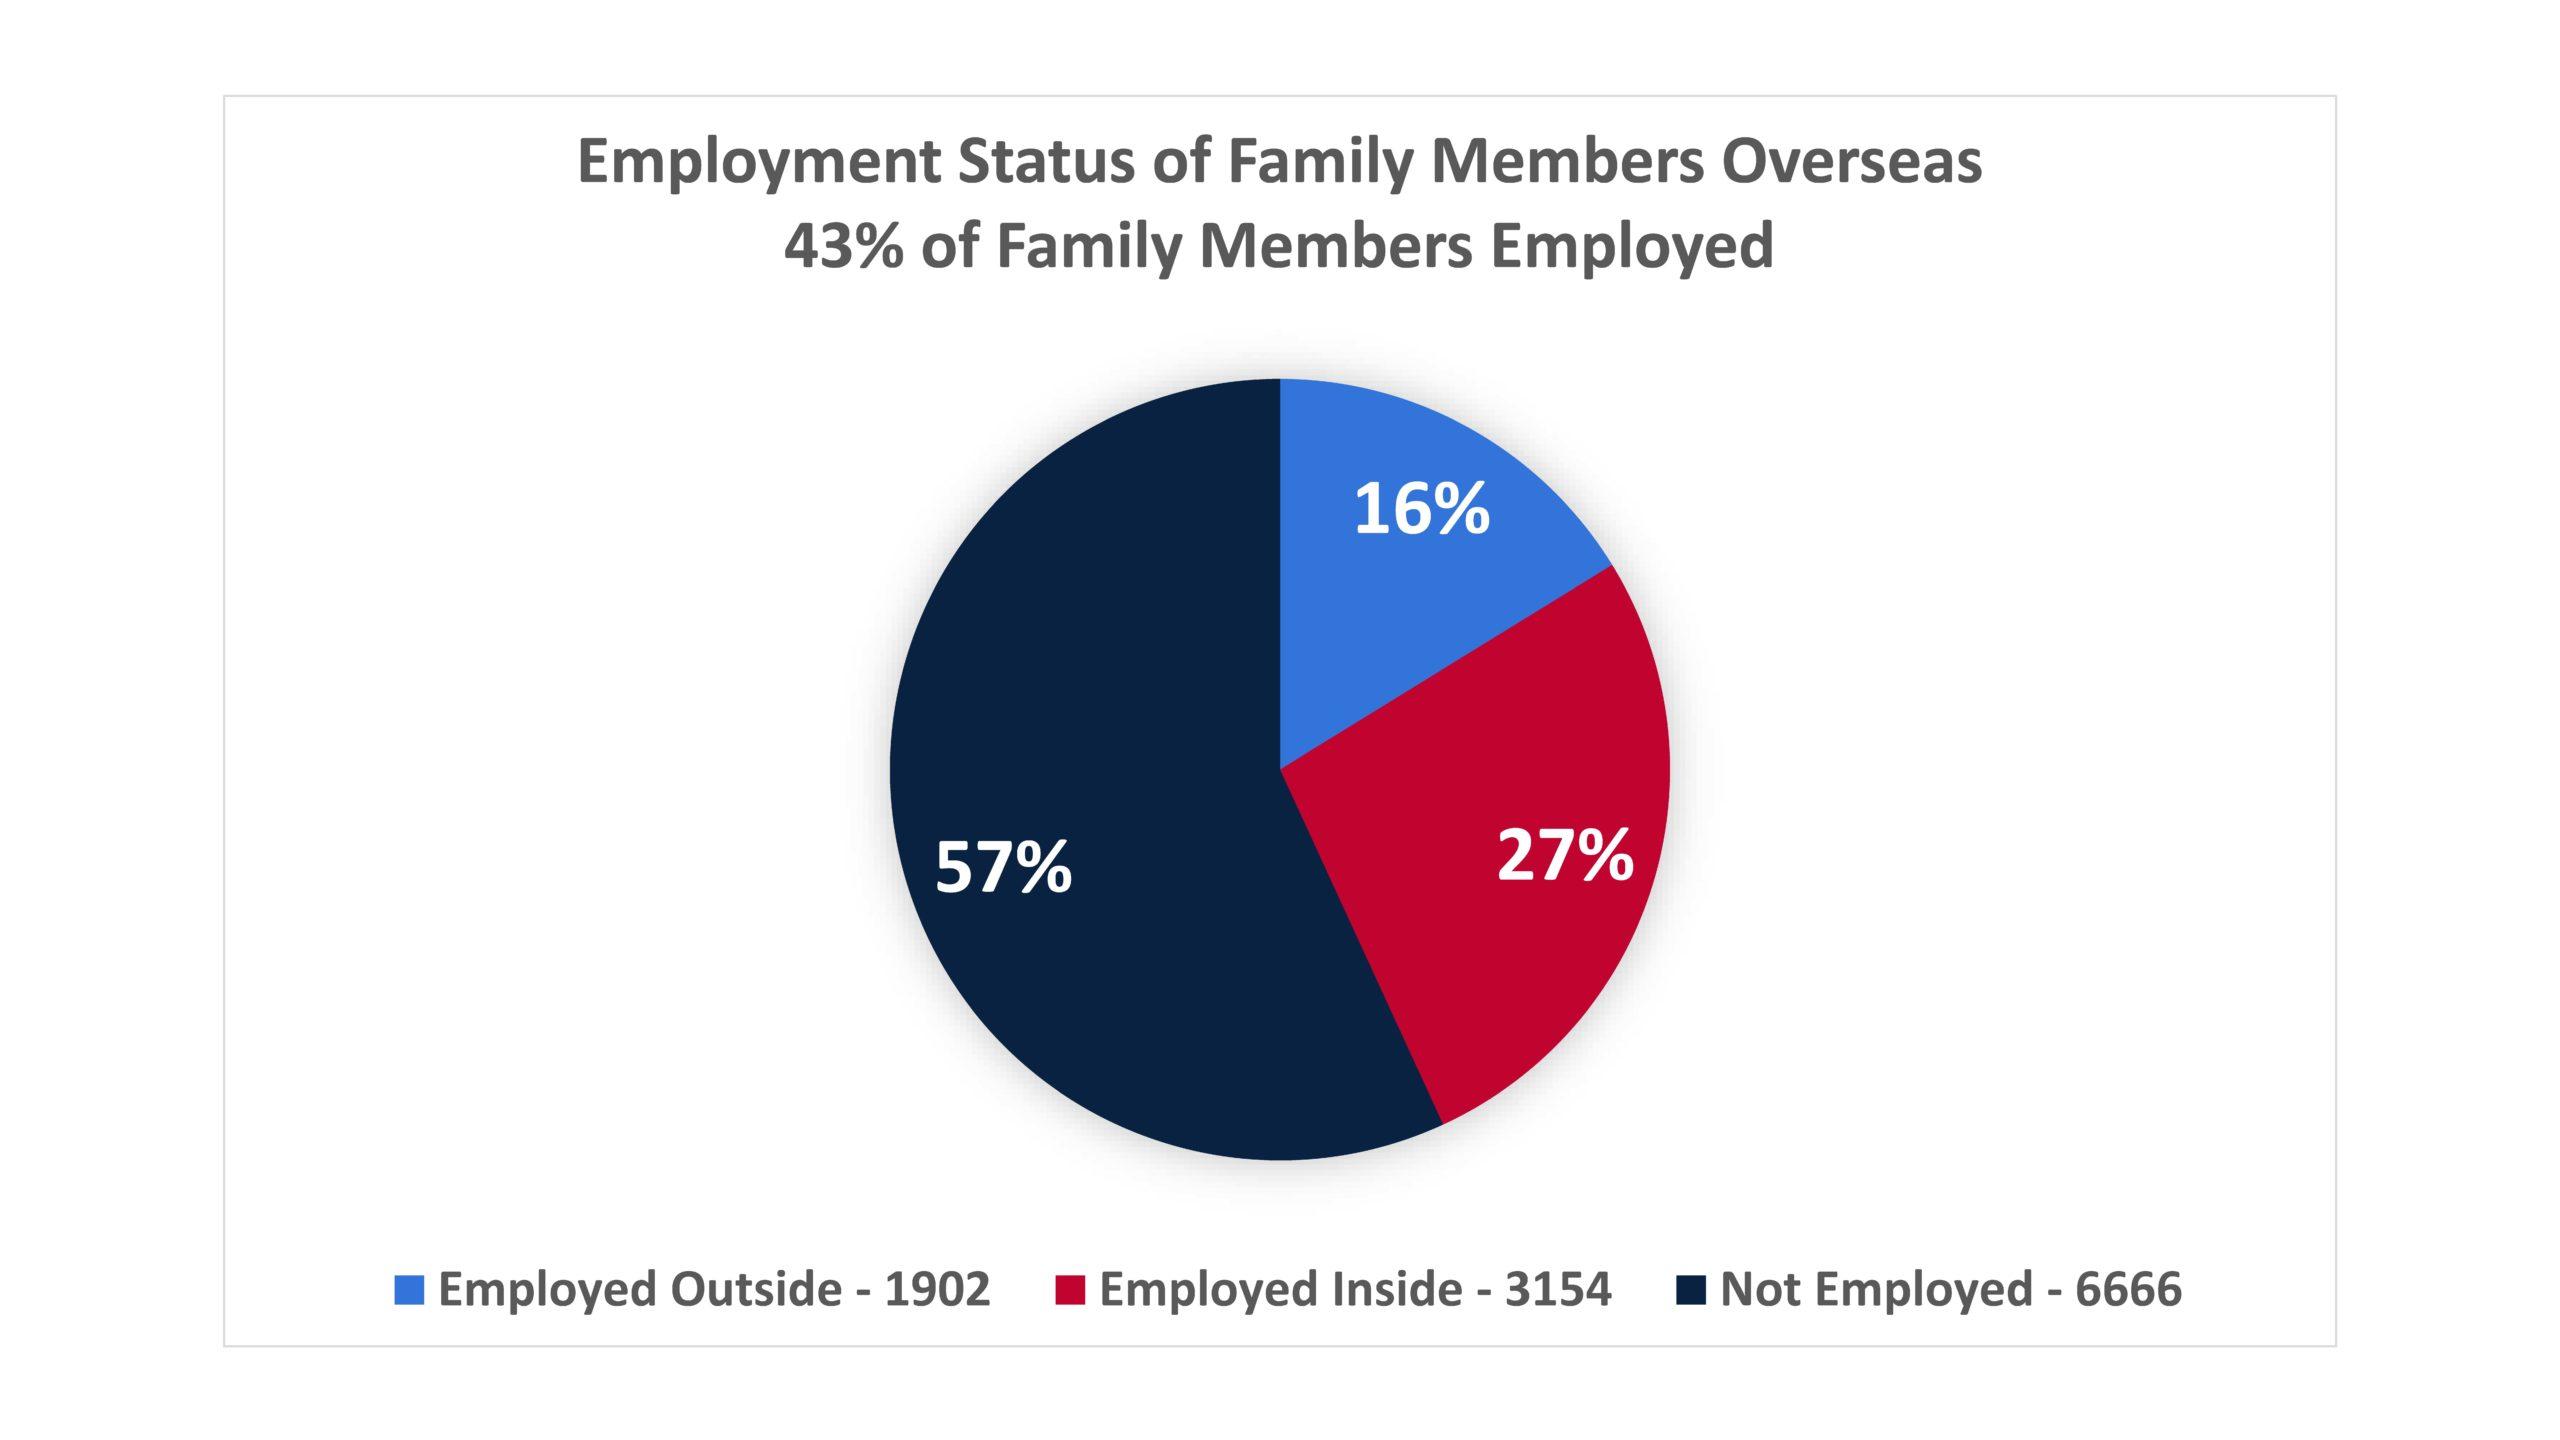 Employment Status of Family Members Overseas 43% of Family Members Employed